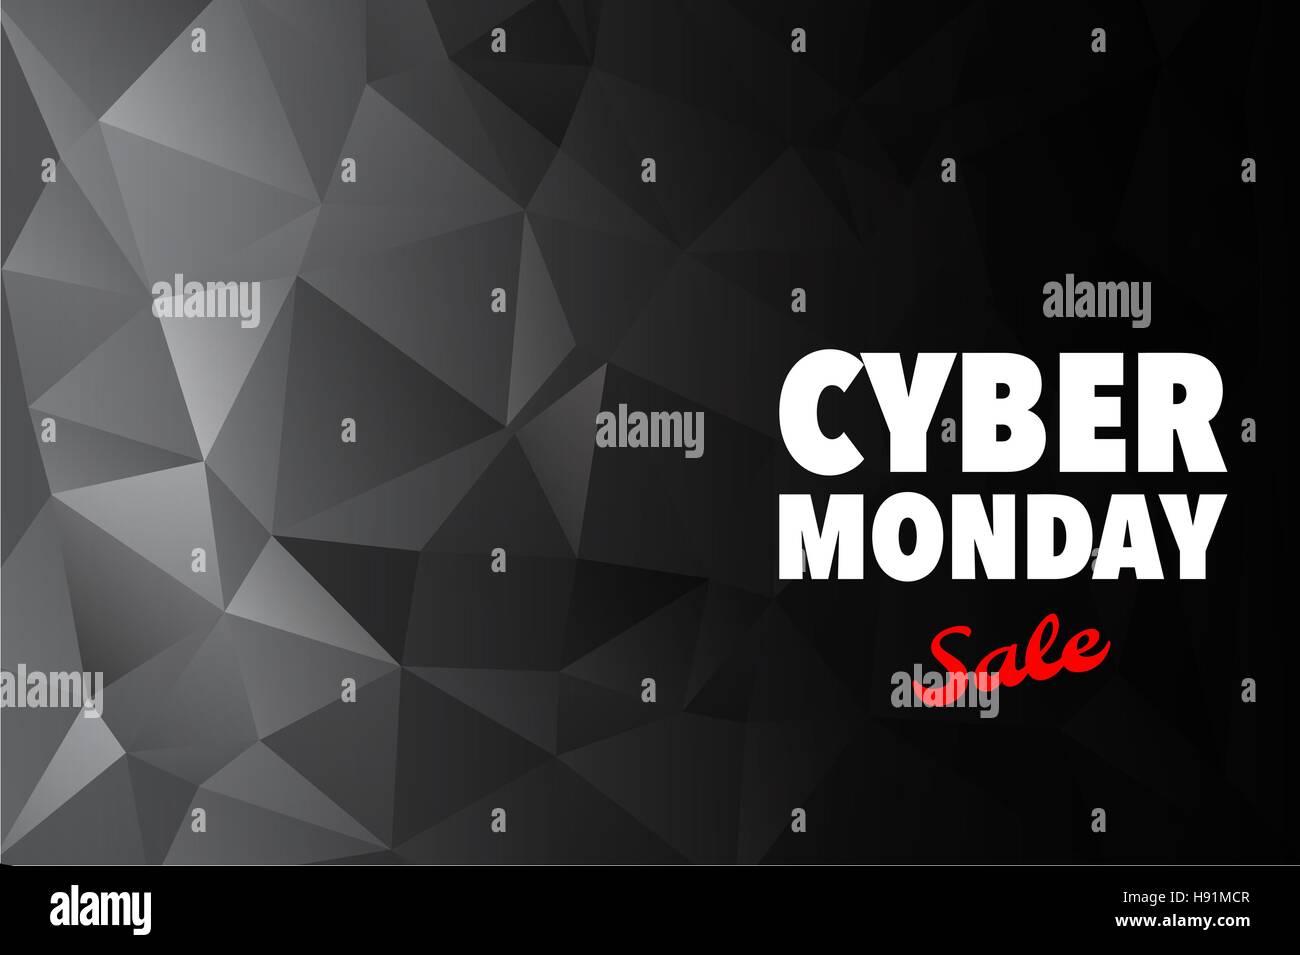 Cyber Montag Werbung Plakat Design Vektor Vorlage Stockbild